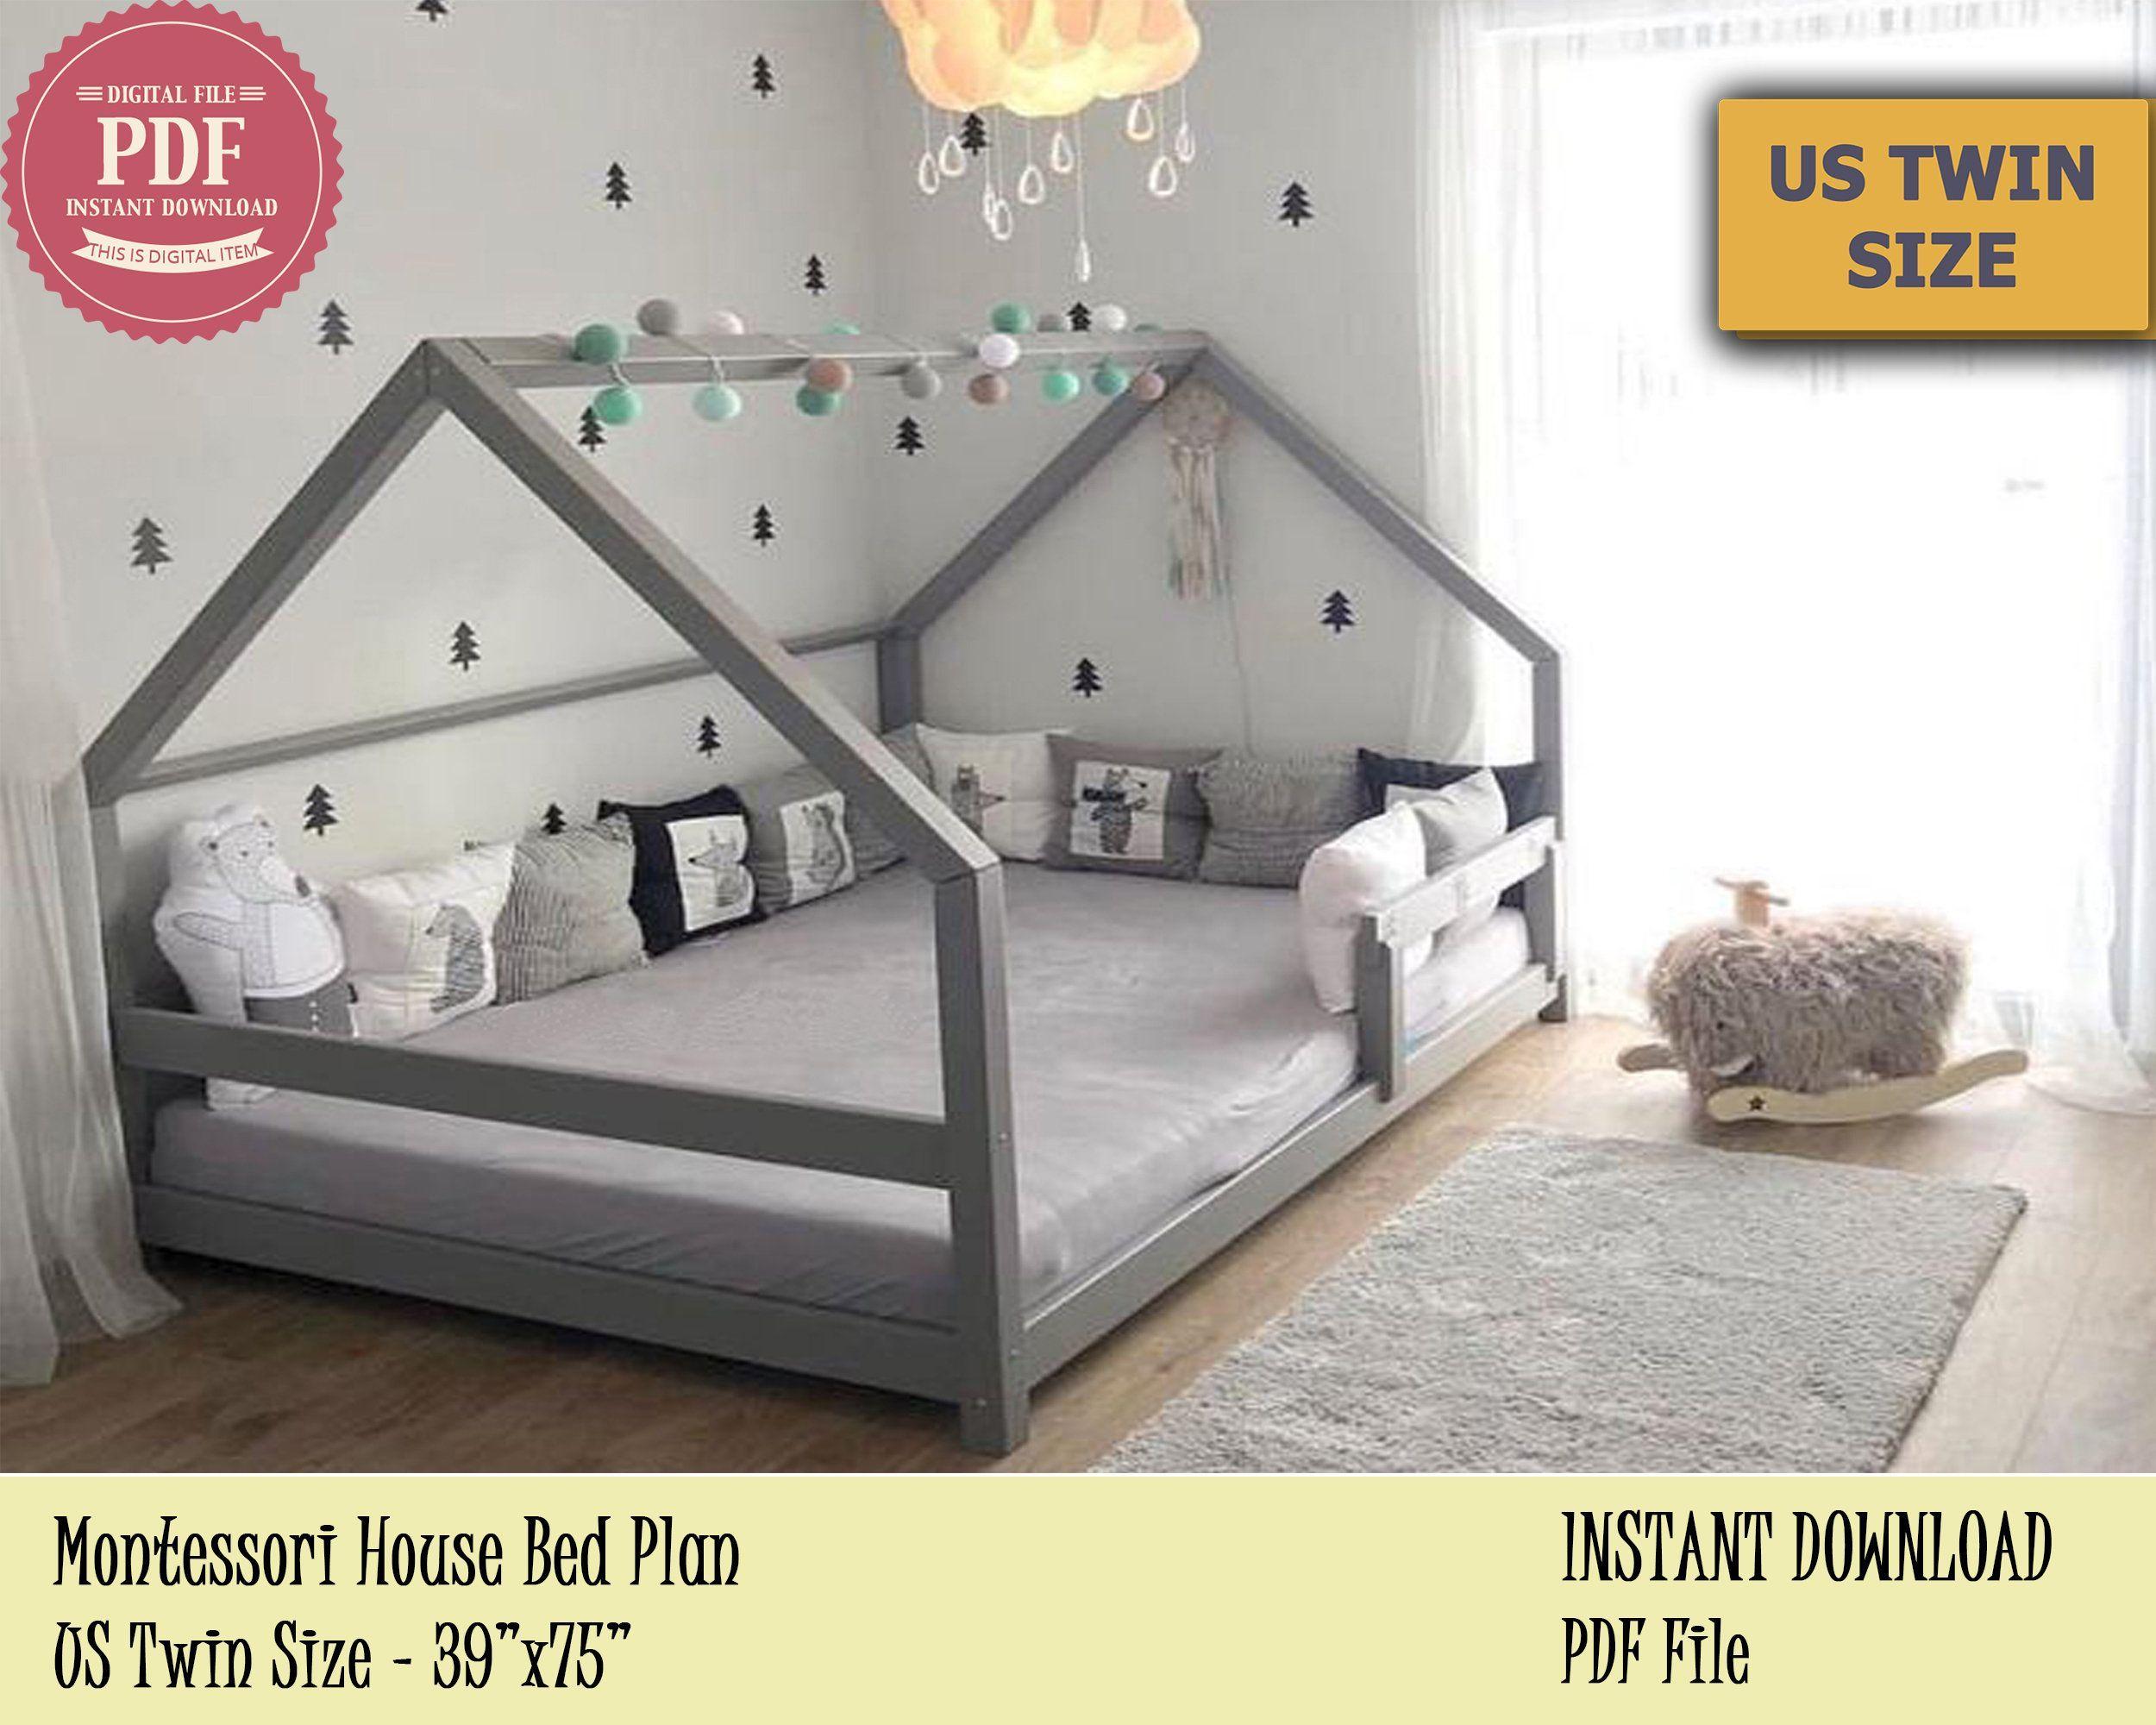 Montessori Bed Twin Bed Plan Toddler Bed House Bed Frame Diy Wooden Floor Bed For Kids Bedroom Exc Toddler House Bed Toddler Bed Frame Toddler Bedrooms Toddler bed with twin mattress